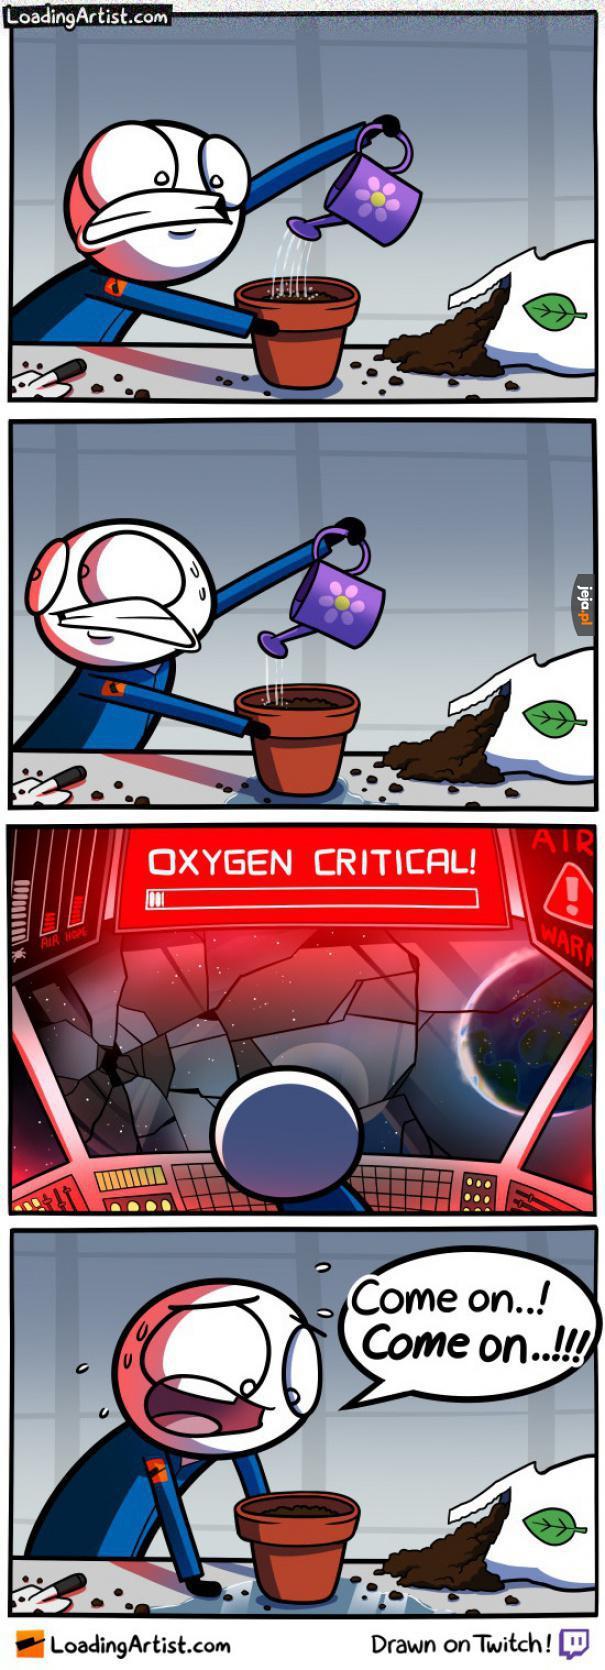 Tlenu, potrzebujemy tlenu!